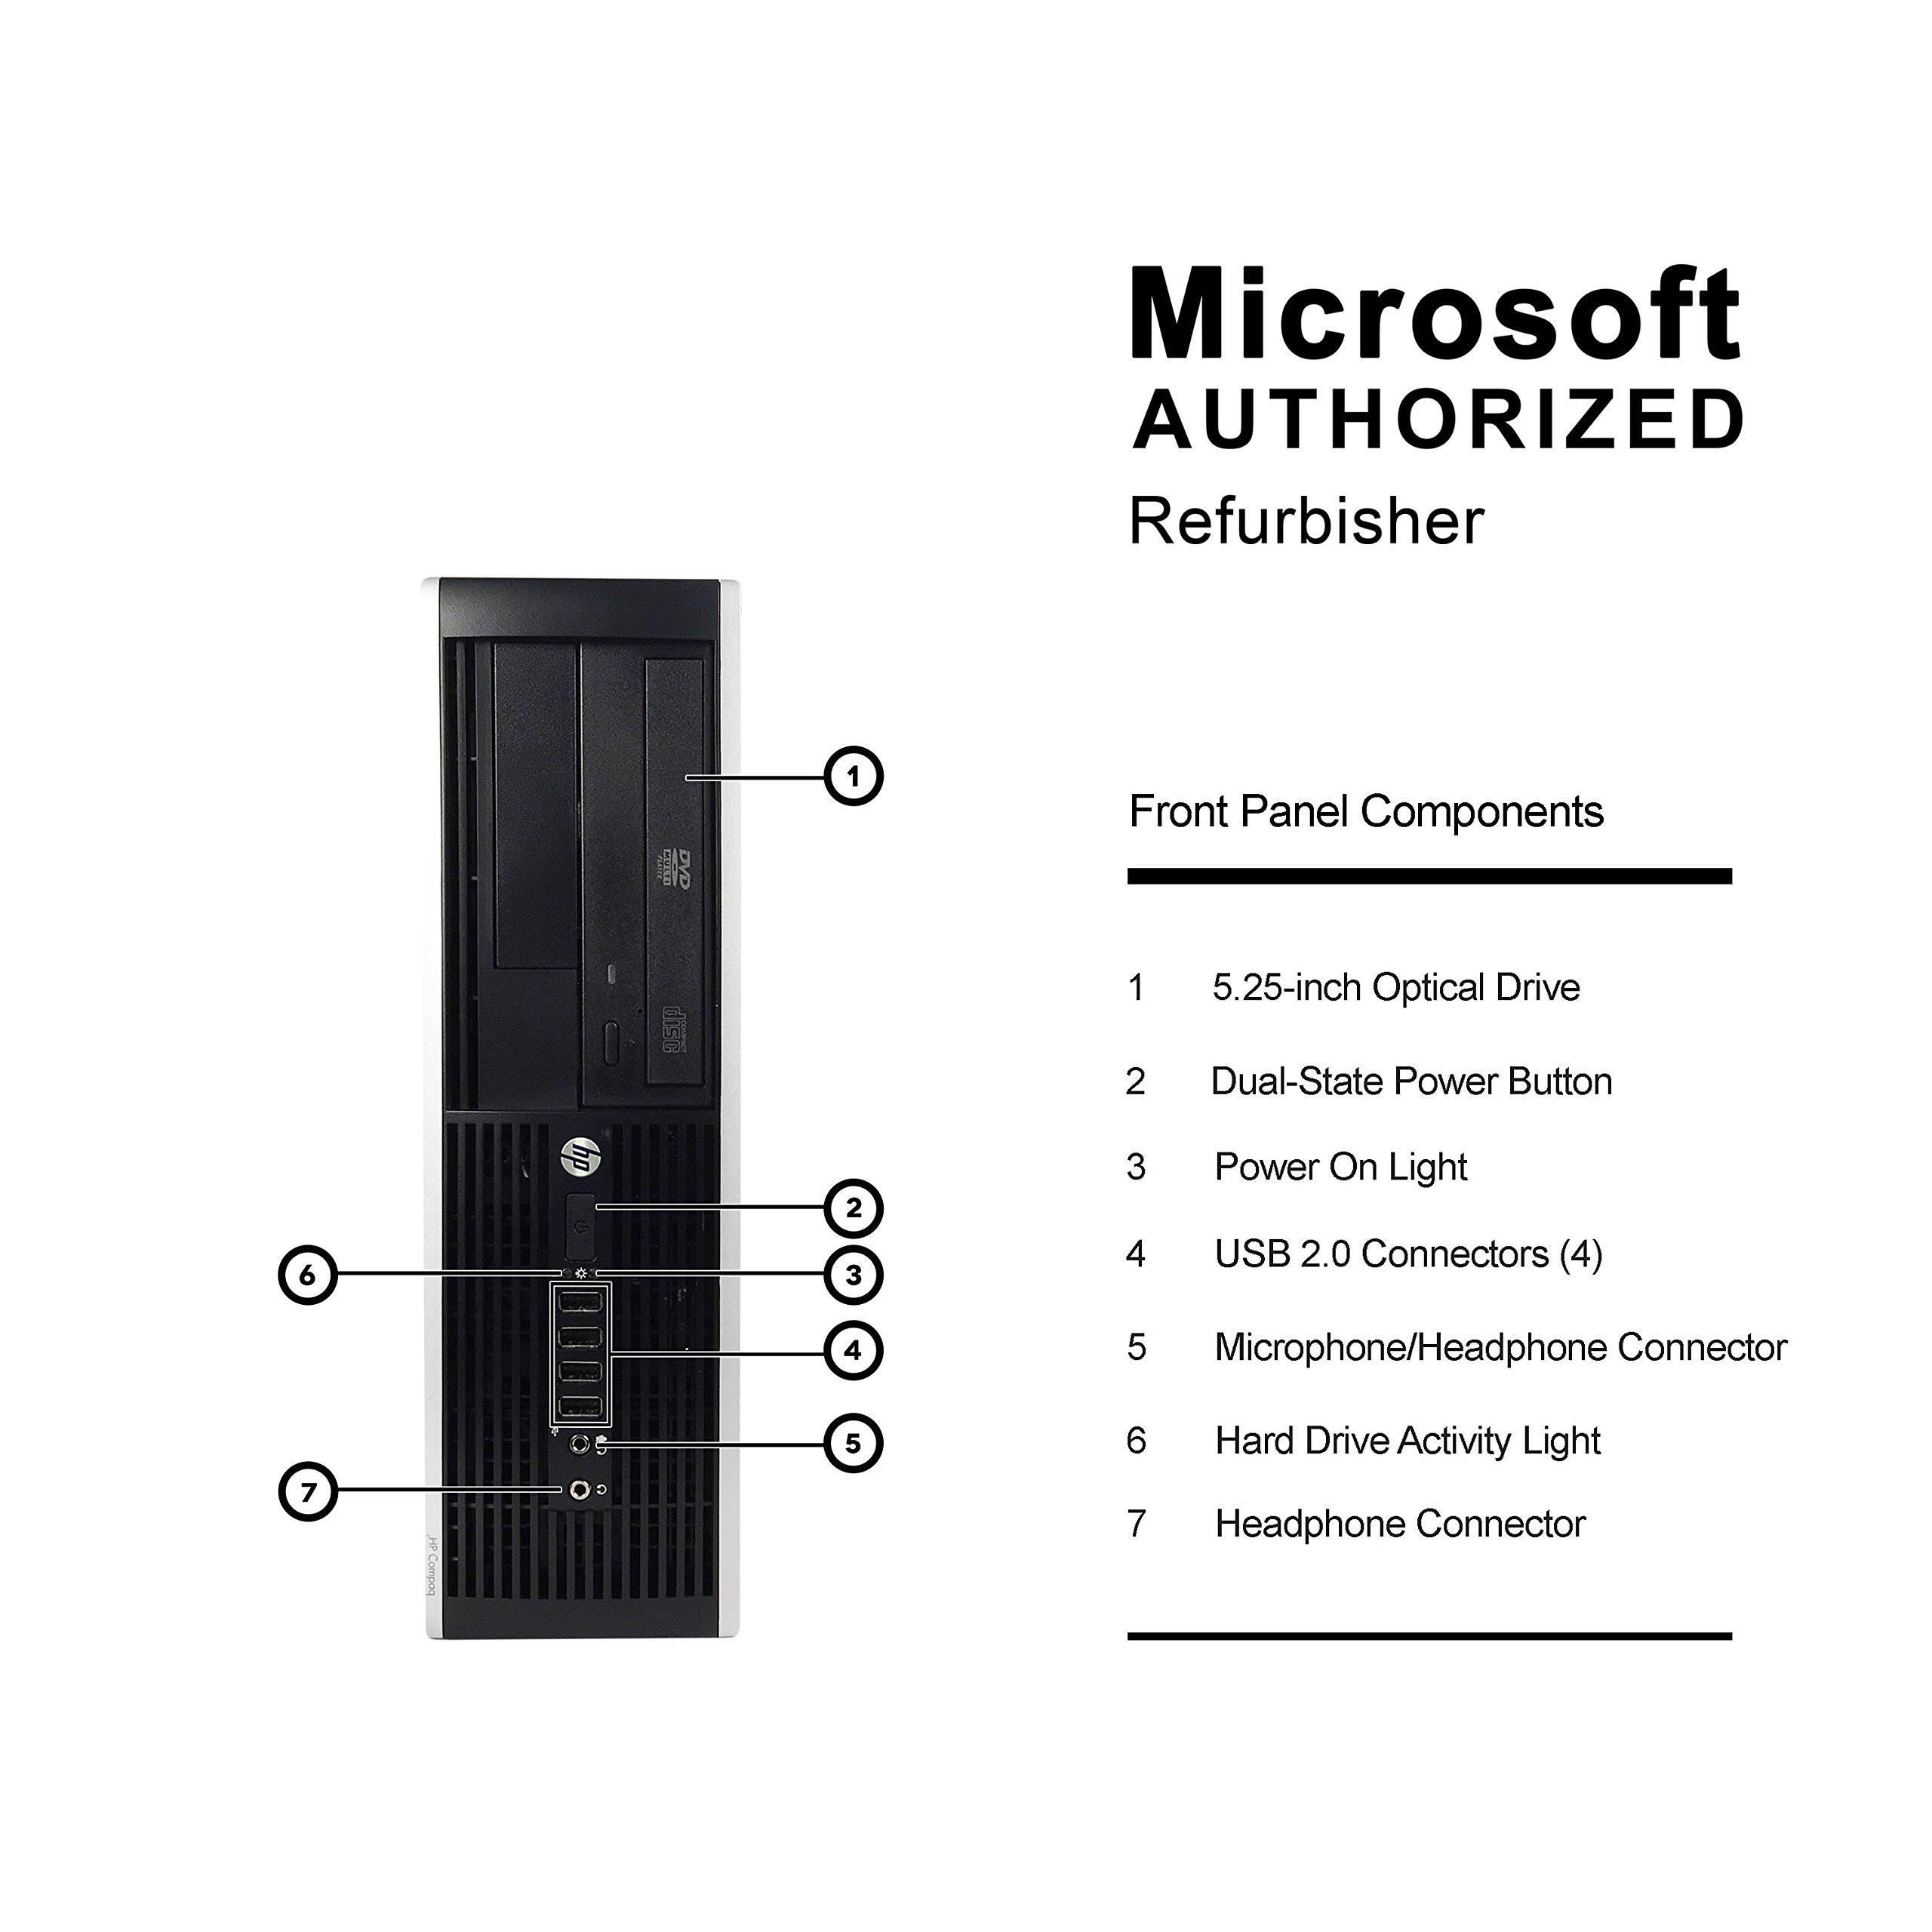 HP Elite 8300 mini PC Business High Performance Desktop Computer(Intel Core i7-3770 3.4GB,16G DDR3,240G SSD+3TB,DVD,Radeon 6350 HD+Dual DVI Cable,WiFi,Windows 10 Professional)(Certified Refurbished)